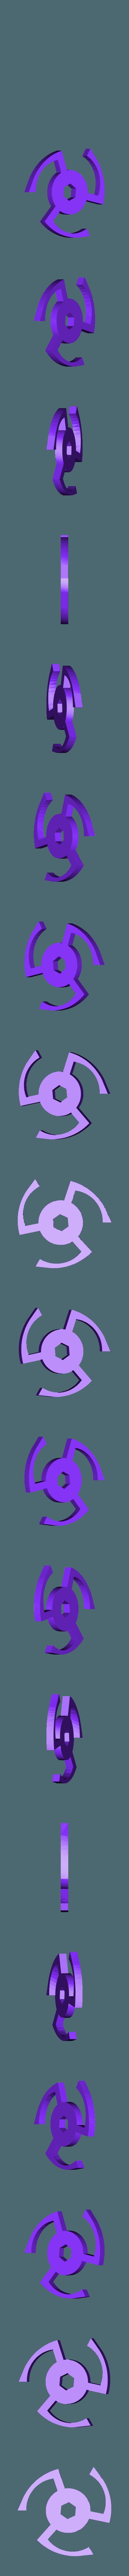 Pawl.stl Download free STL file Windup Bunny • 3D printing design, gzumwalt